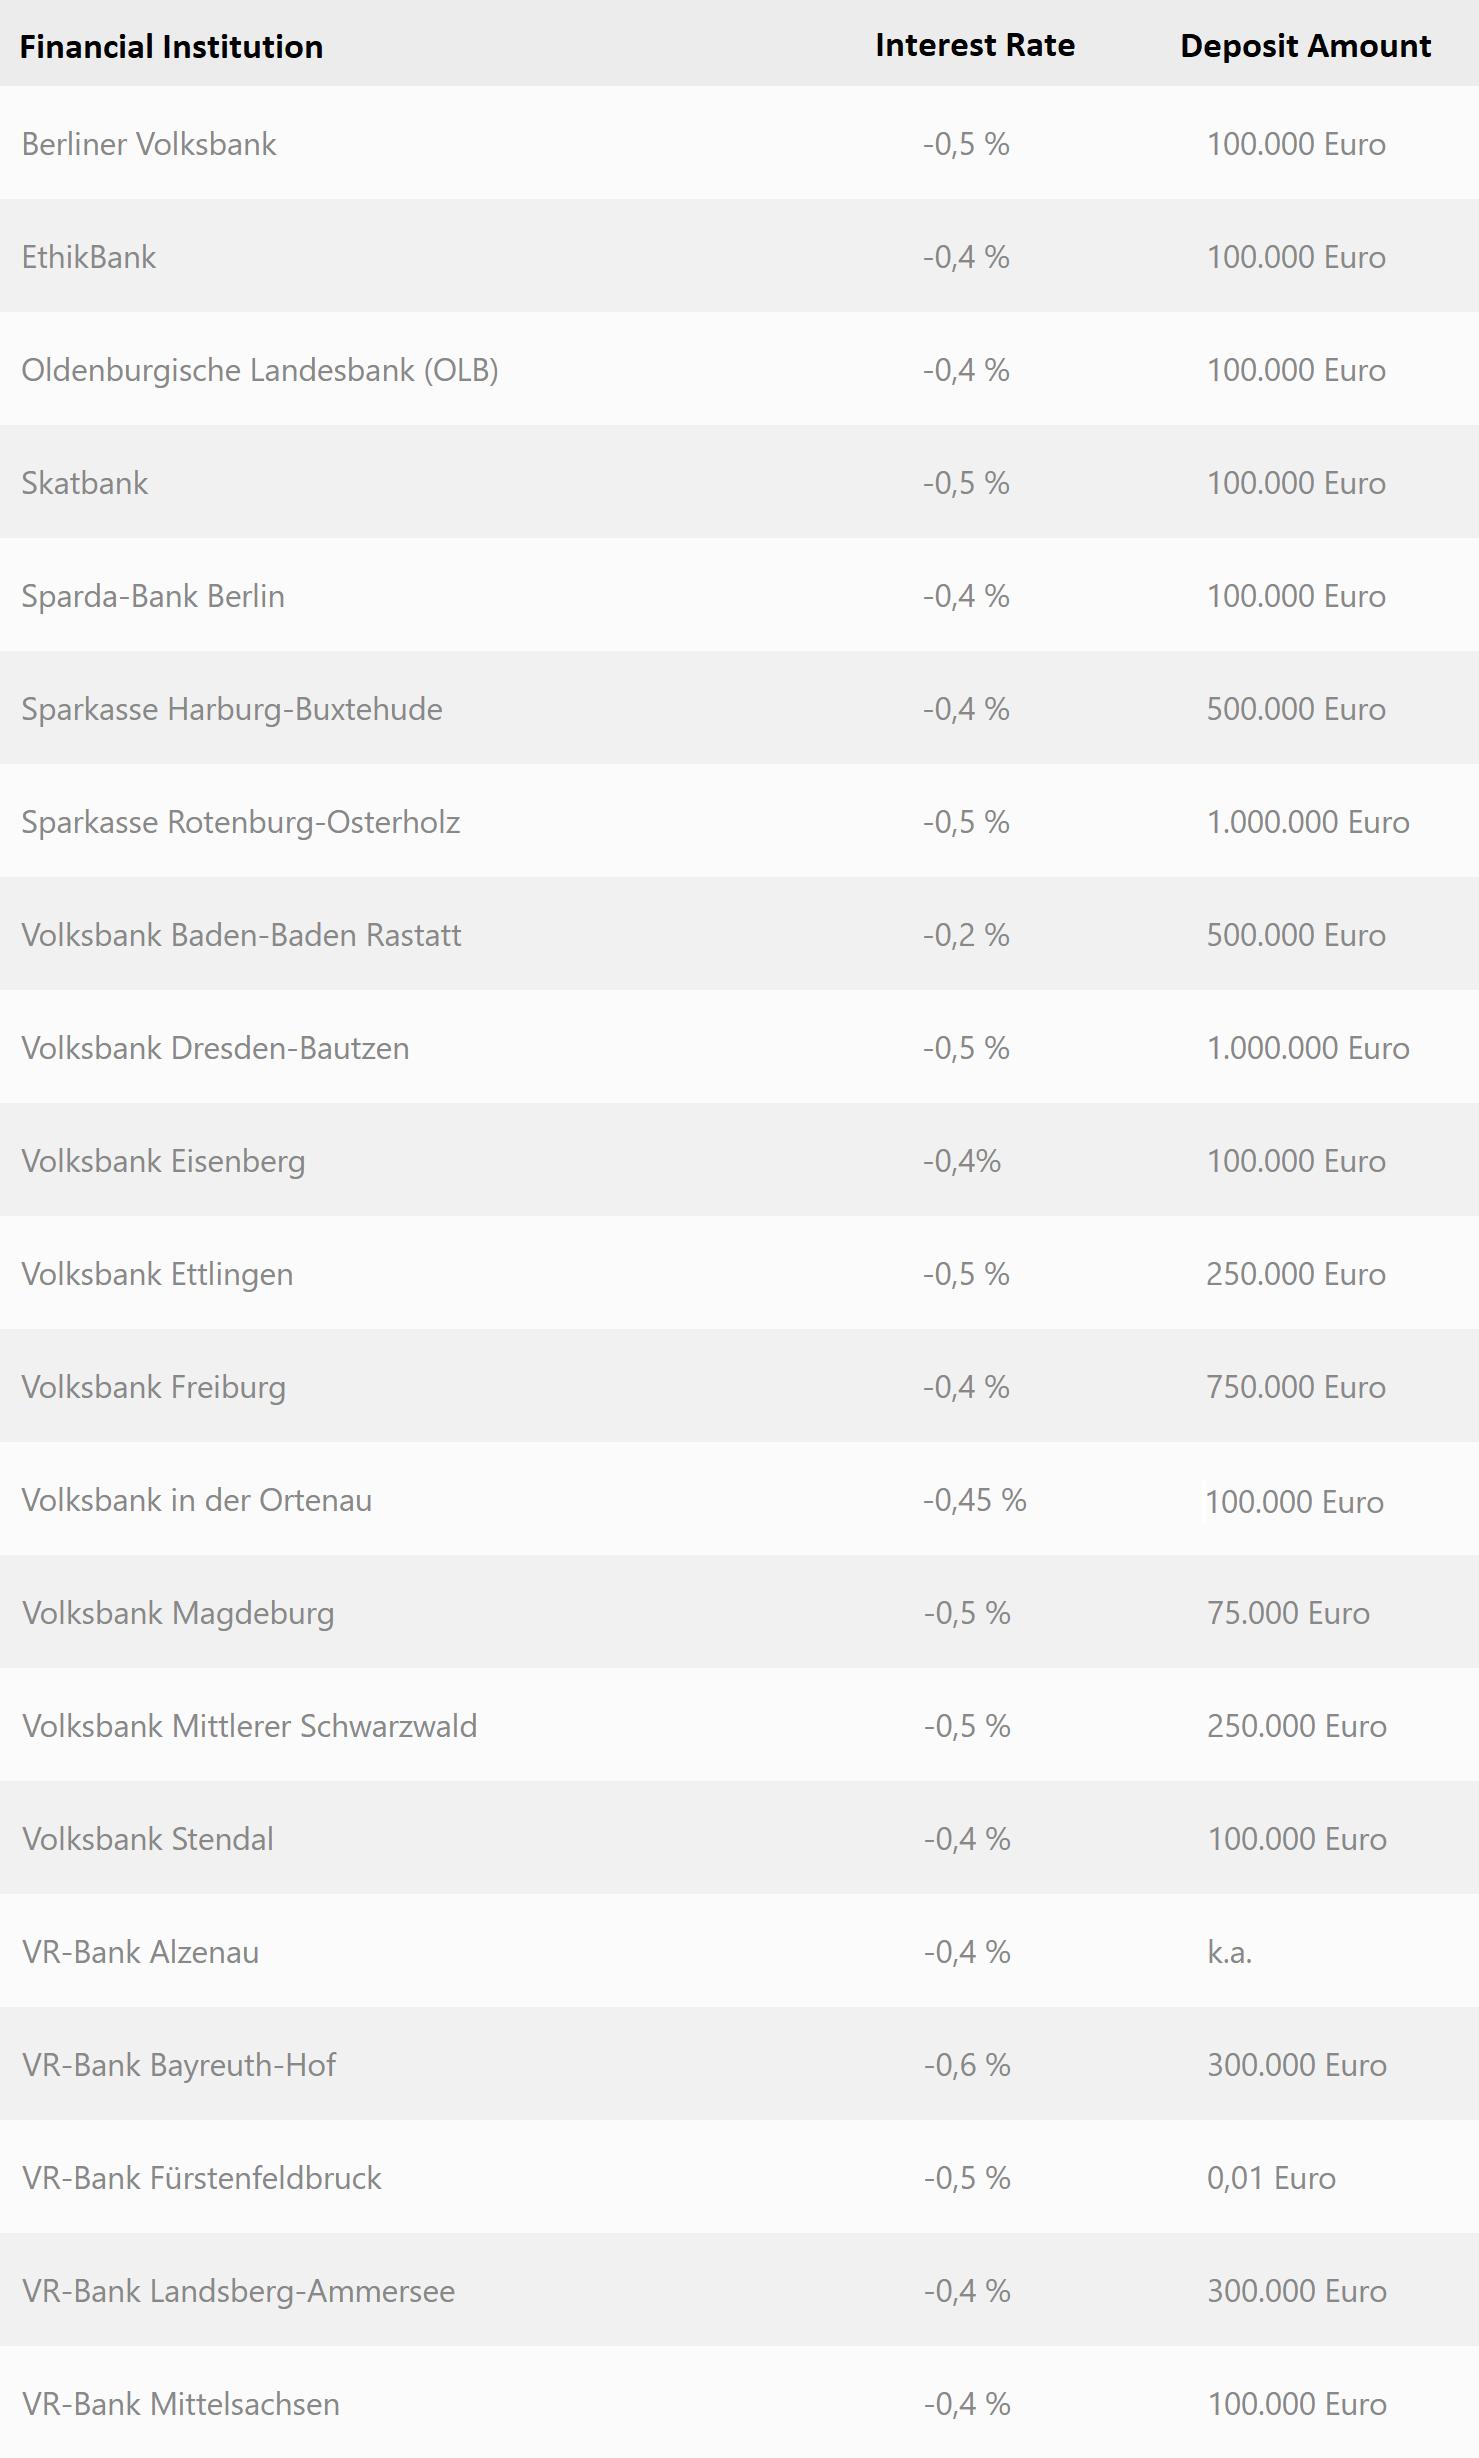 "Encuesta: 58% de los bancos alemanes cobran tasas de interés negativas ""ancho ="" 1479 ""altura = ""2458"" srcset = ""https://blackswanfinances.com/wp-content/uploads/2019/11/list-of-german-banks-with-negative-interest-rates-1.png 1479w, https: / /news.bitcoin.com/wp-content/uploads/2019/11/list-of-german-banks-with-negative-interest-rates-1-181x300.png 181w, https://news.bitcoin.com/ wp-content / uploads / 2019/11 / list-of-german-banks-with-negative-tasa de interés-1-616x1024.png 616w, https://news.bitcoin.com/wp-content/uploads/2019 /11/list-of-german-banks-with-negative-interest-rates-1-768x1276.png 768w, https://news.bitcoin.com/wp-content/uploads/2019/11/list-of- bancos alemanes con tasas de interés negativas 1-924x1536.png 924w, https://news.bitcoin.com/wp-content/uploads/2019/11/list-of-german-banks-with-negative -interest-rates-1-1232x2048.png 1232w, https : //news.bitcoin.com/wp-content/uploads/2019/11/list-of-german-banks-with-negative-interest-rates-1-696x1157.png 696w, https: //news.bitcoin. com / wp-content / uploads / 2019/11 / list-of-german-banks-with-negative-tasa de interés-1-1392x2313.png 1392w, https://news.bitcoin.com/wp-content/uploads /2019/11/list-of-german-banks-with-negative-interest-rates-1-1068x1775.png 1068w, https://news.bitcoin.com/wp-content/uploads/2019/11/list- de bancos alemanes con tasas de interés negativas 1-253x420.png 253w ""tamaños ="" (ancho máximo: 1479px) 100vw, 1479px"